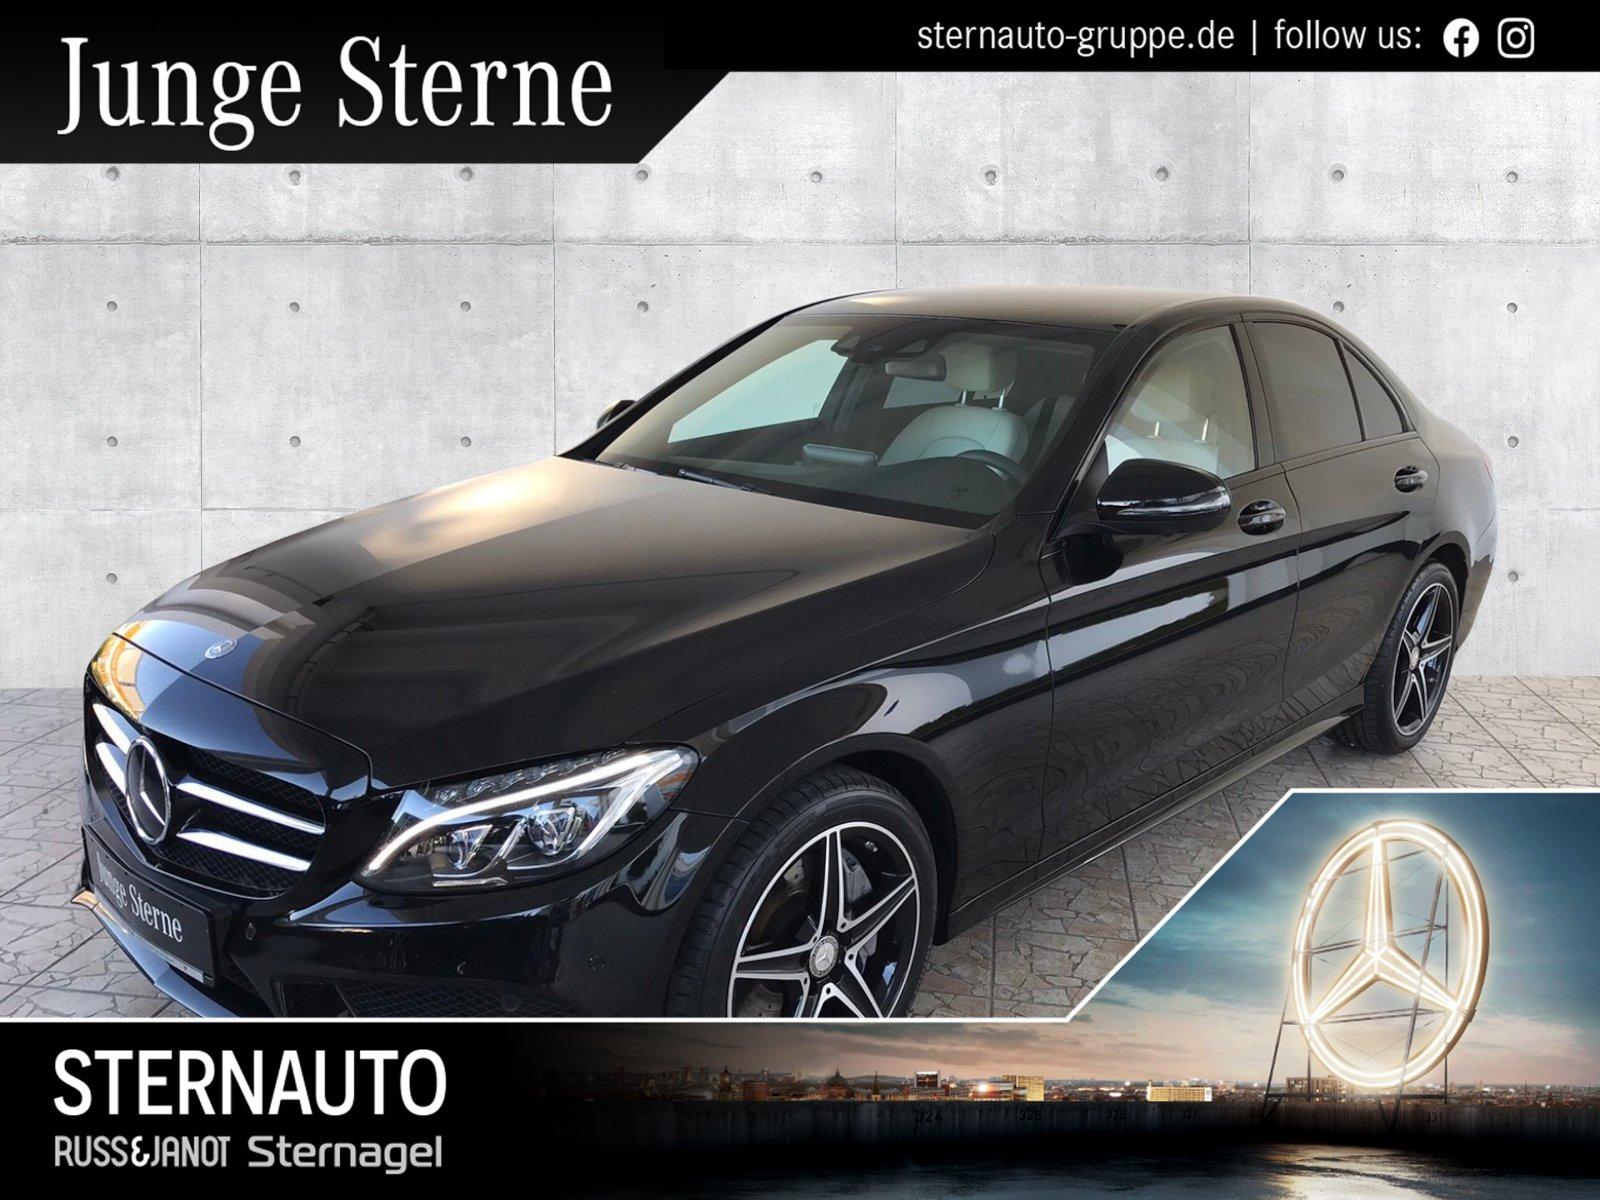 Mercedes-Benz C 400 4M AMG Line/COMAND/Distronic/360°-Kamera, Jahr 2016, Benzin